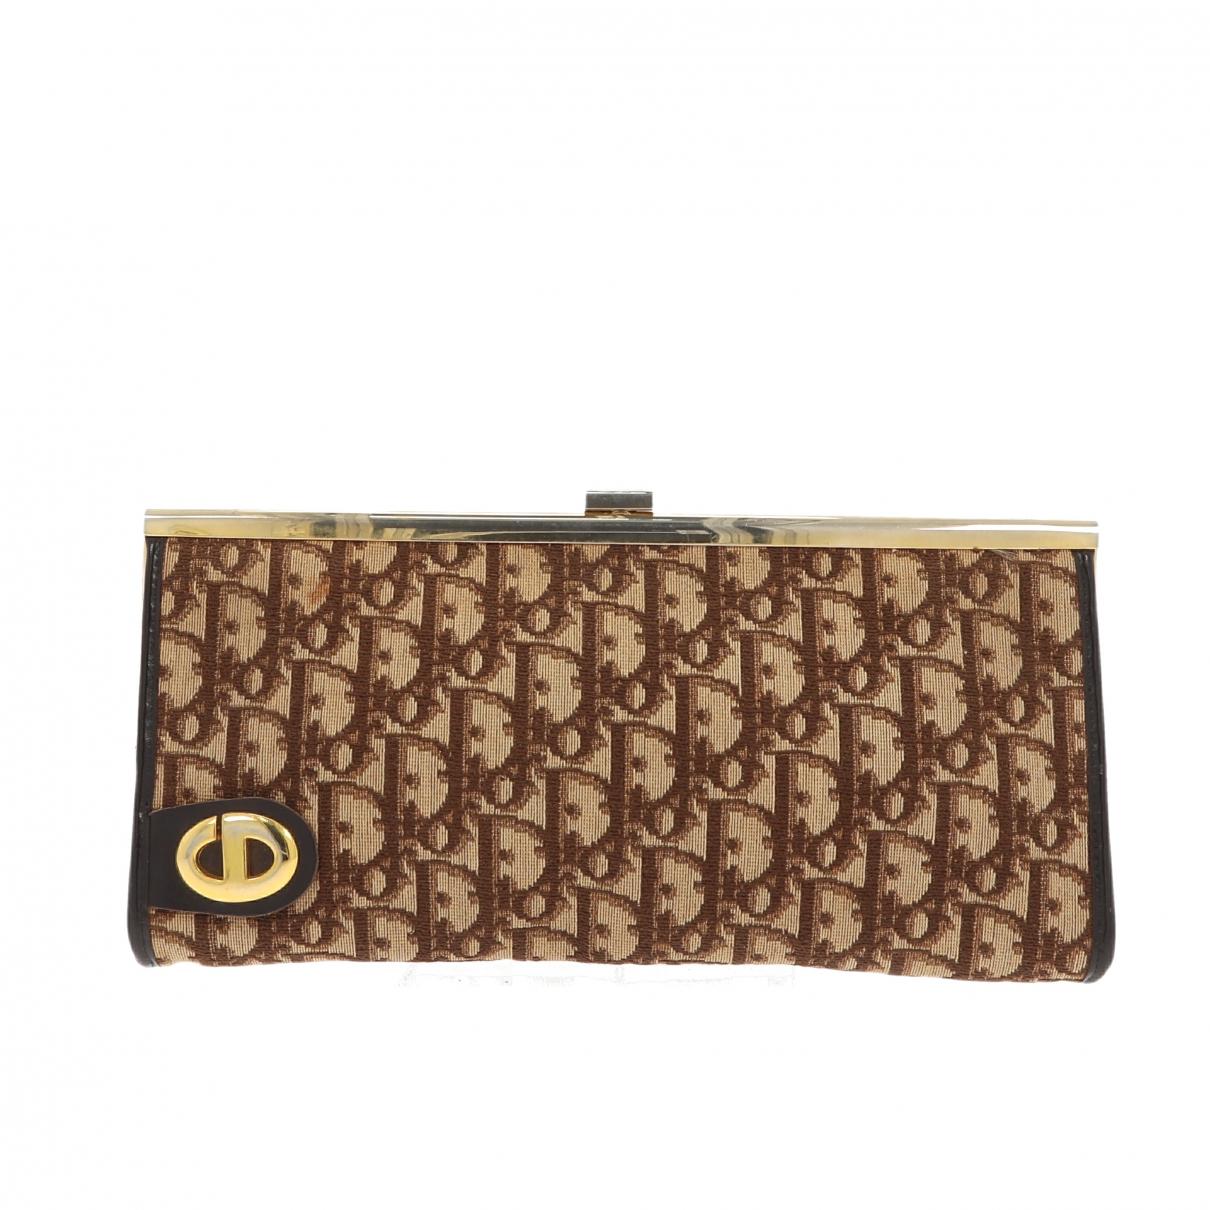 Christian Dior \N Beige Cloth Clutch bag for Women \N